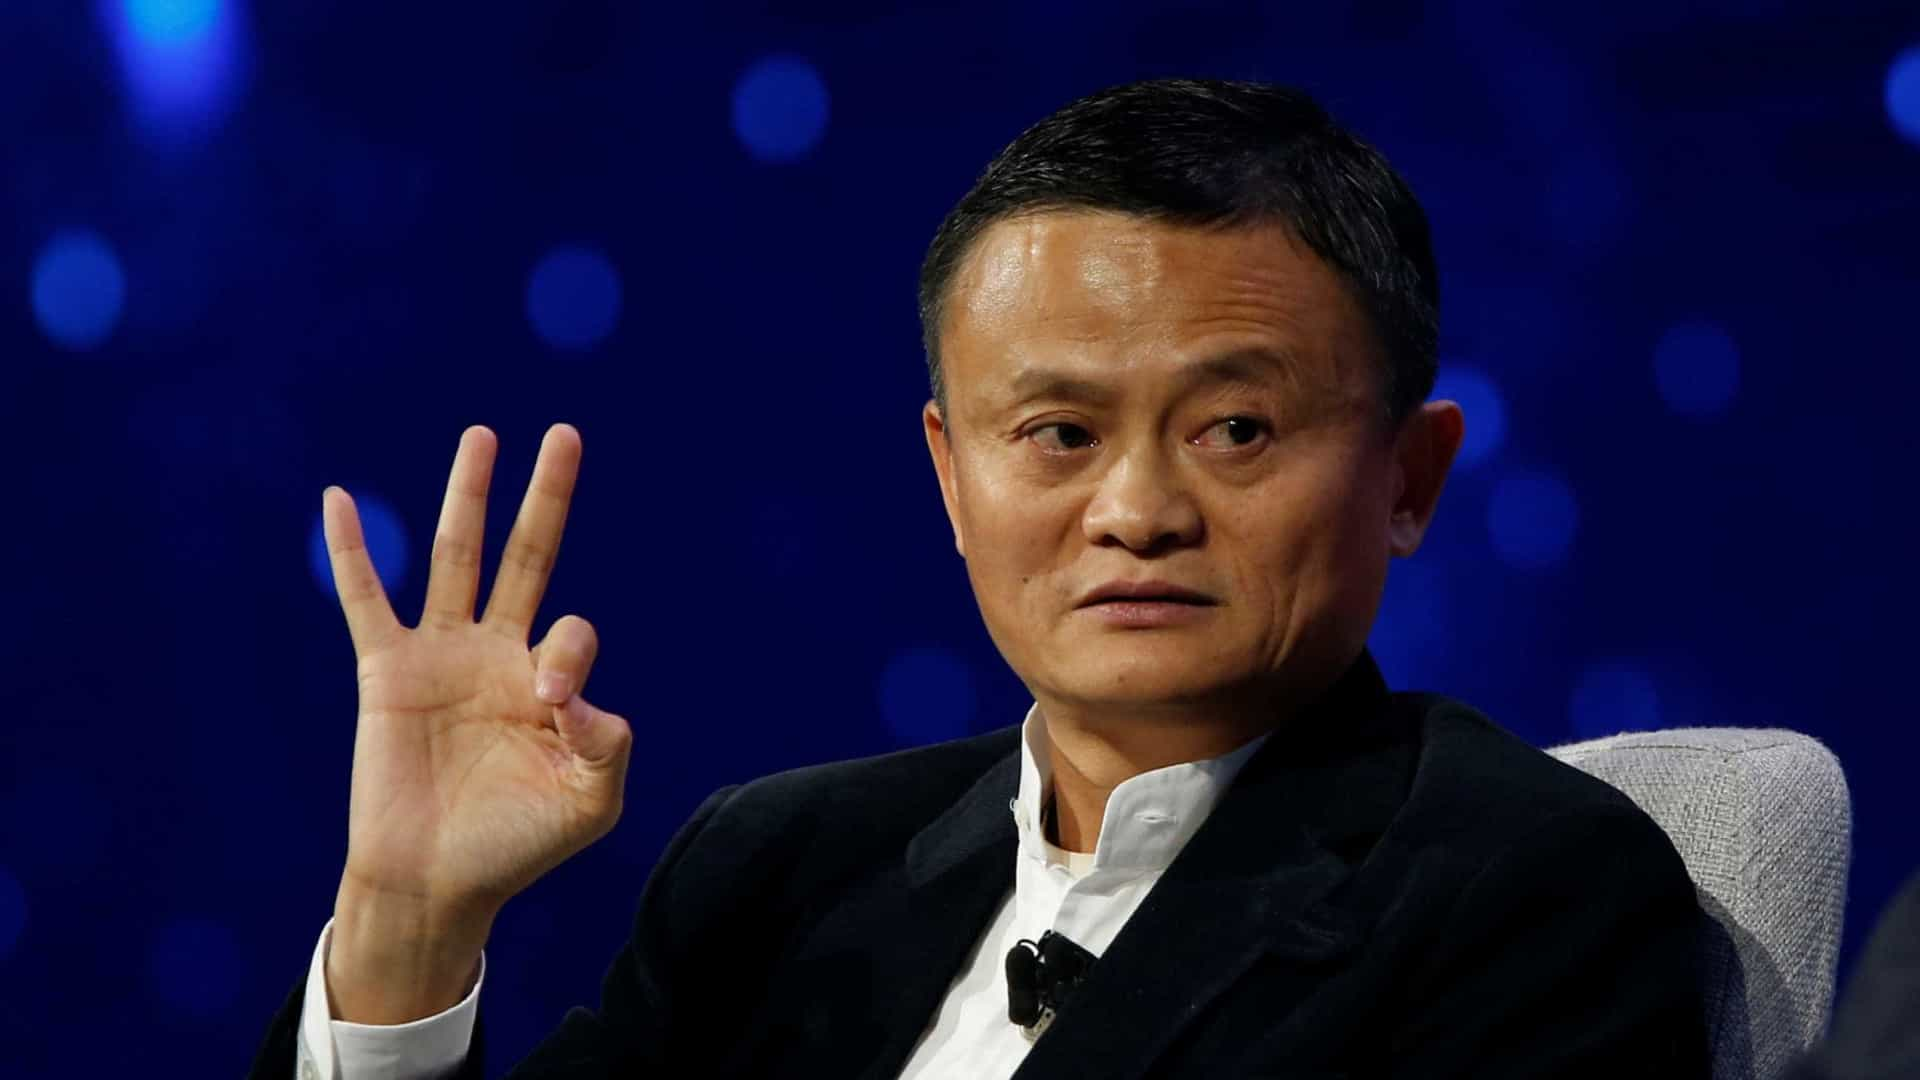 Governo chinês pede ao grupo Alibaba que se desfaça de activos na imprensa